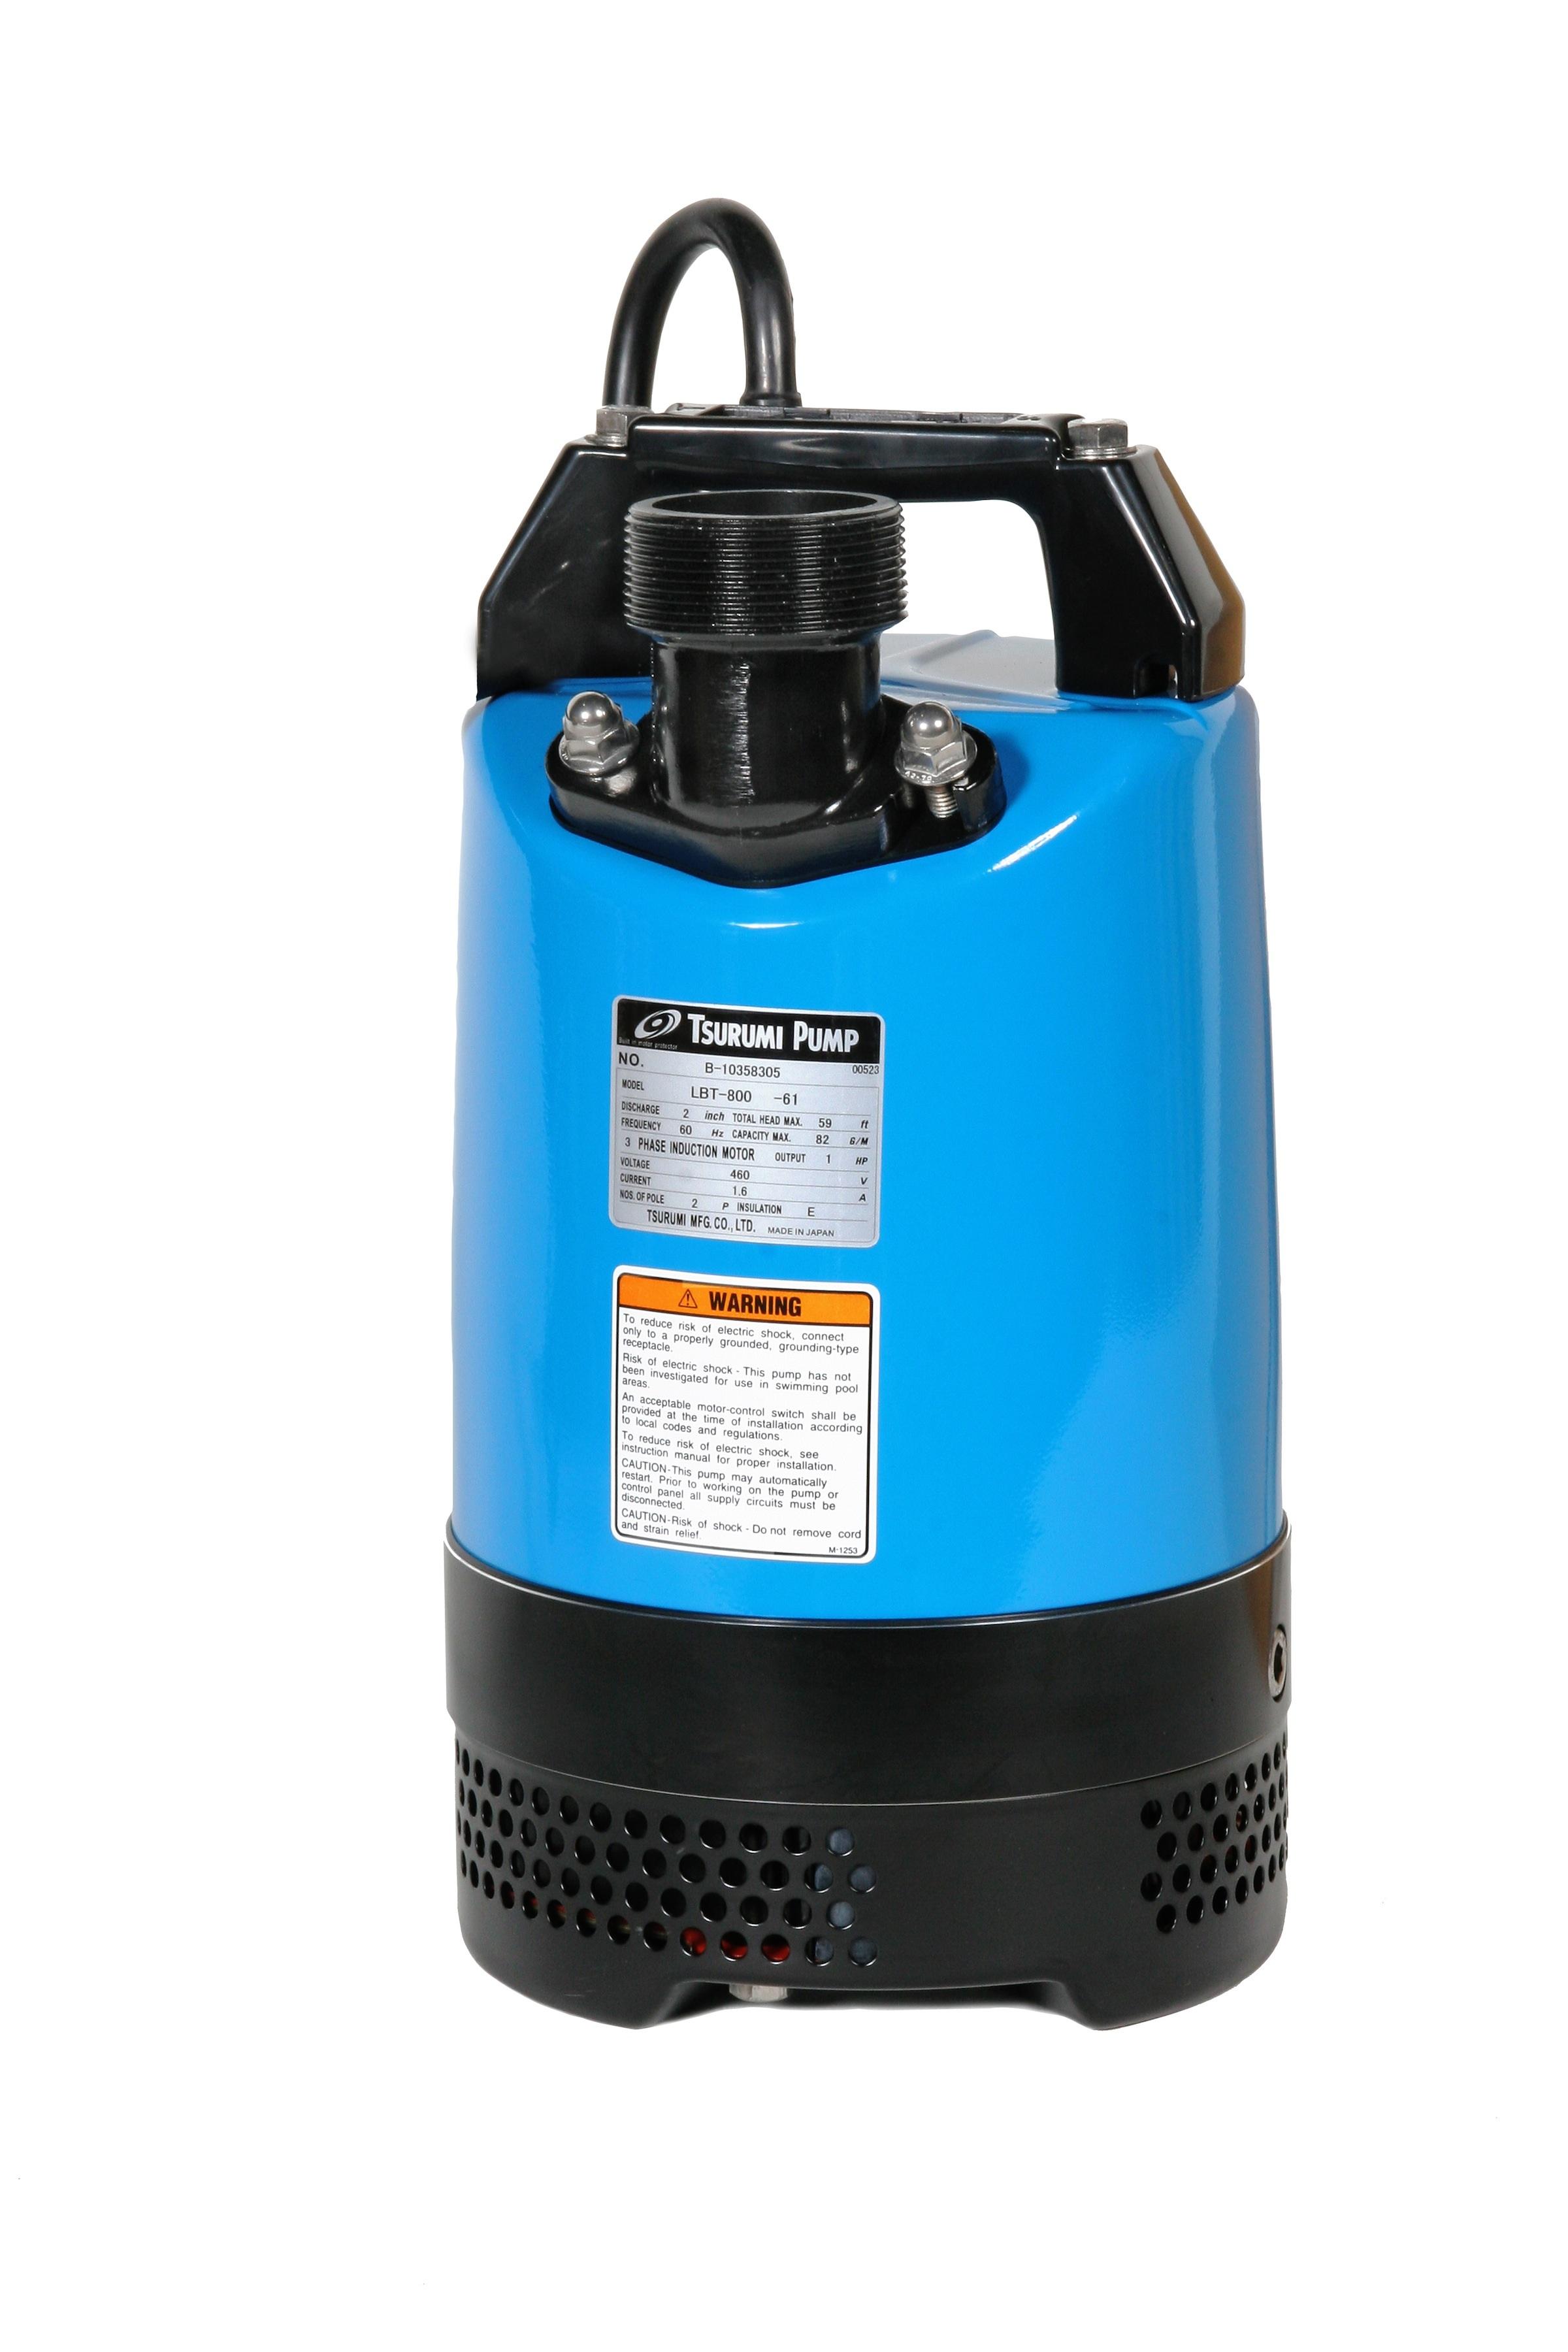 Tsurumi lb 800 pumpe